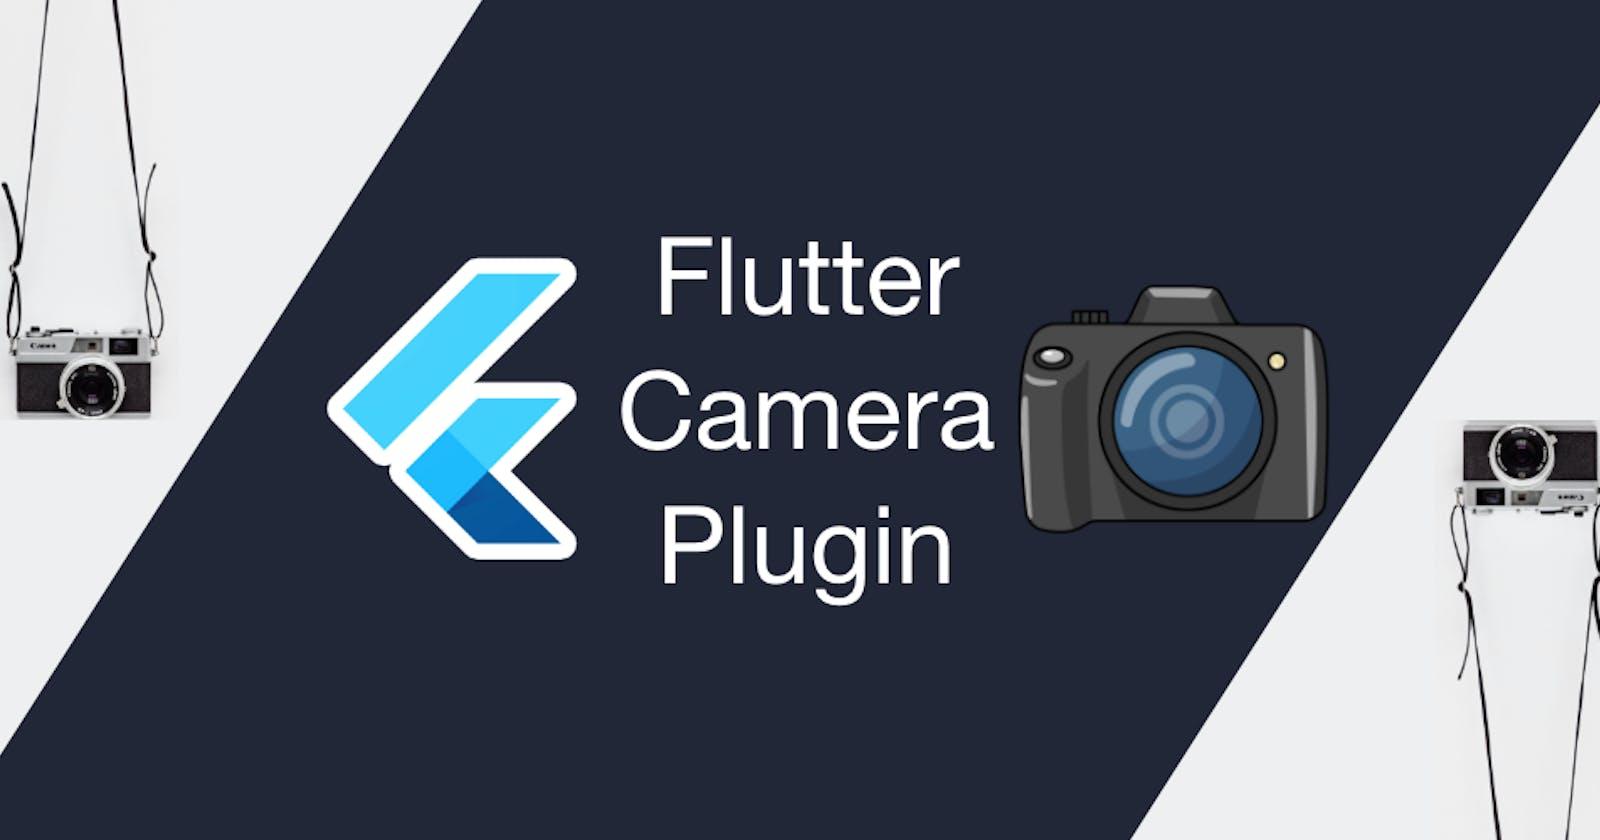 Exploring the Flutter camera plugin